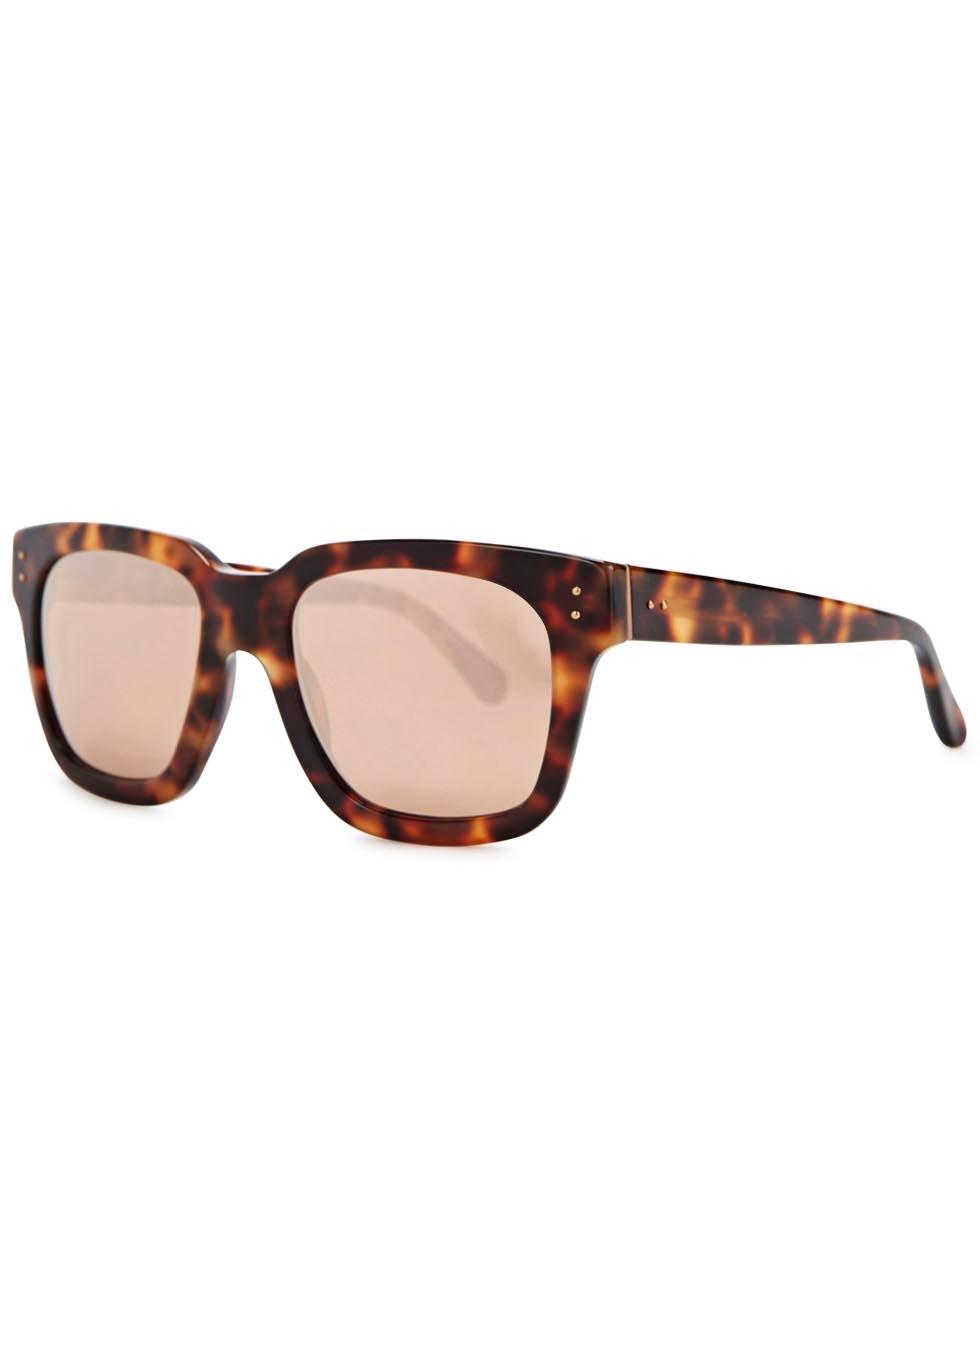 ae8b0b2f883a Women s Designer Sunglasses and Eyewear - Harvey Nichols